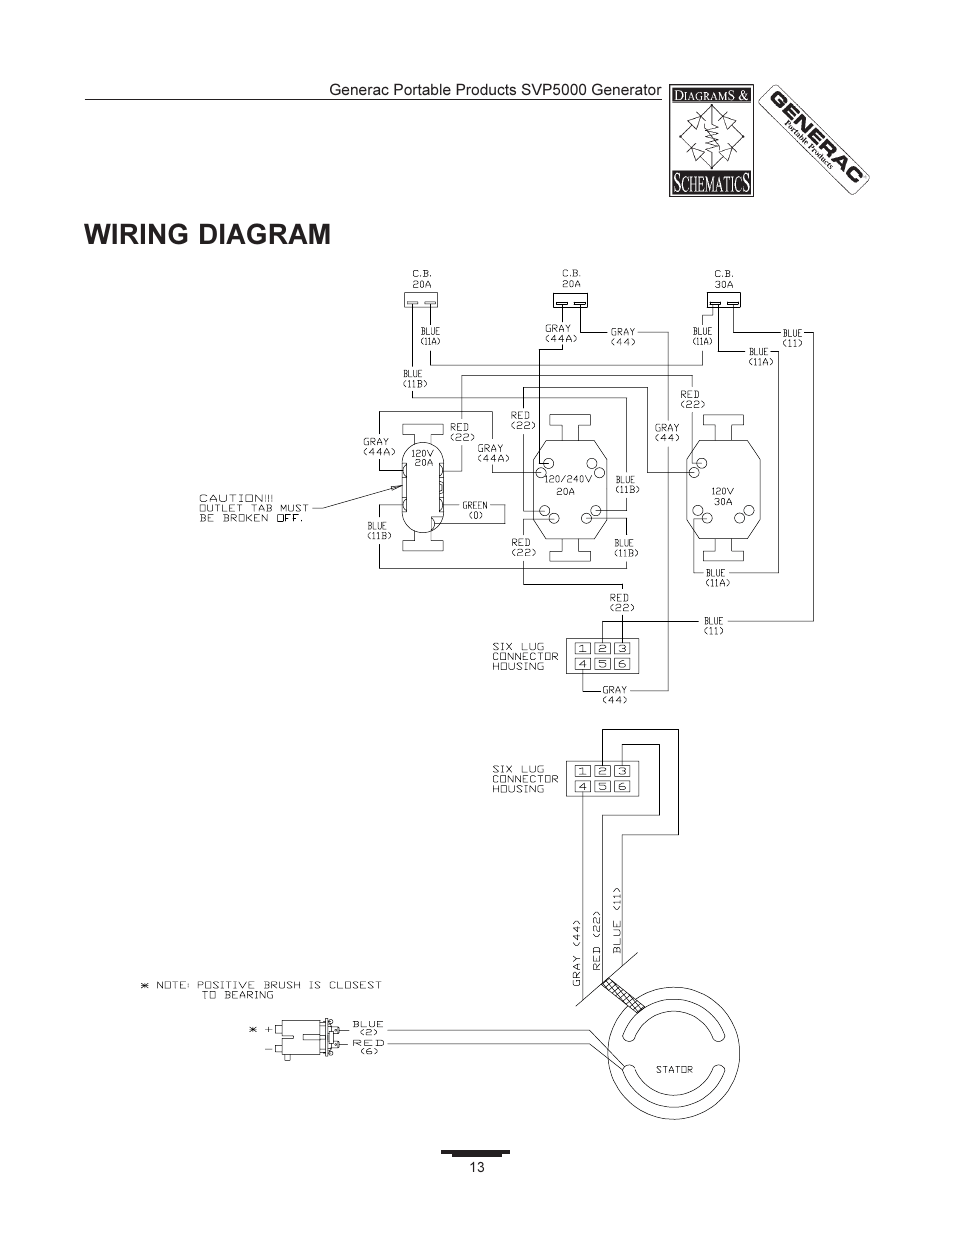 medium resolution of generac wiring schematic wiring diagram technic